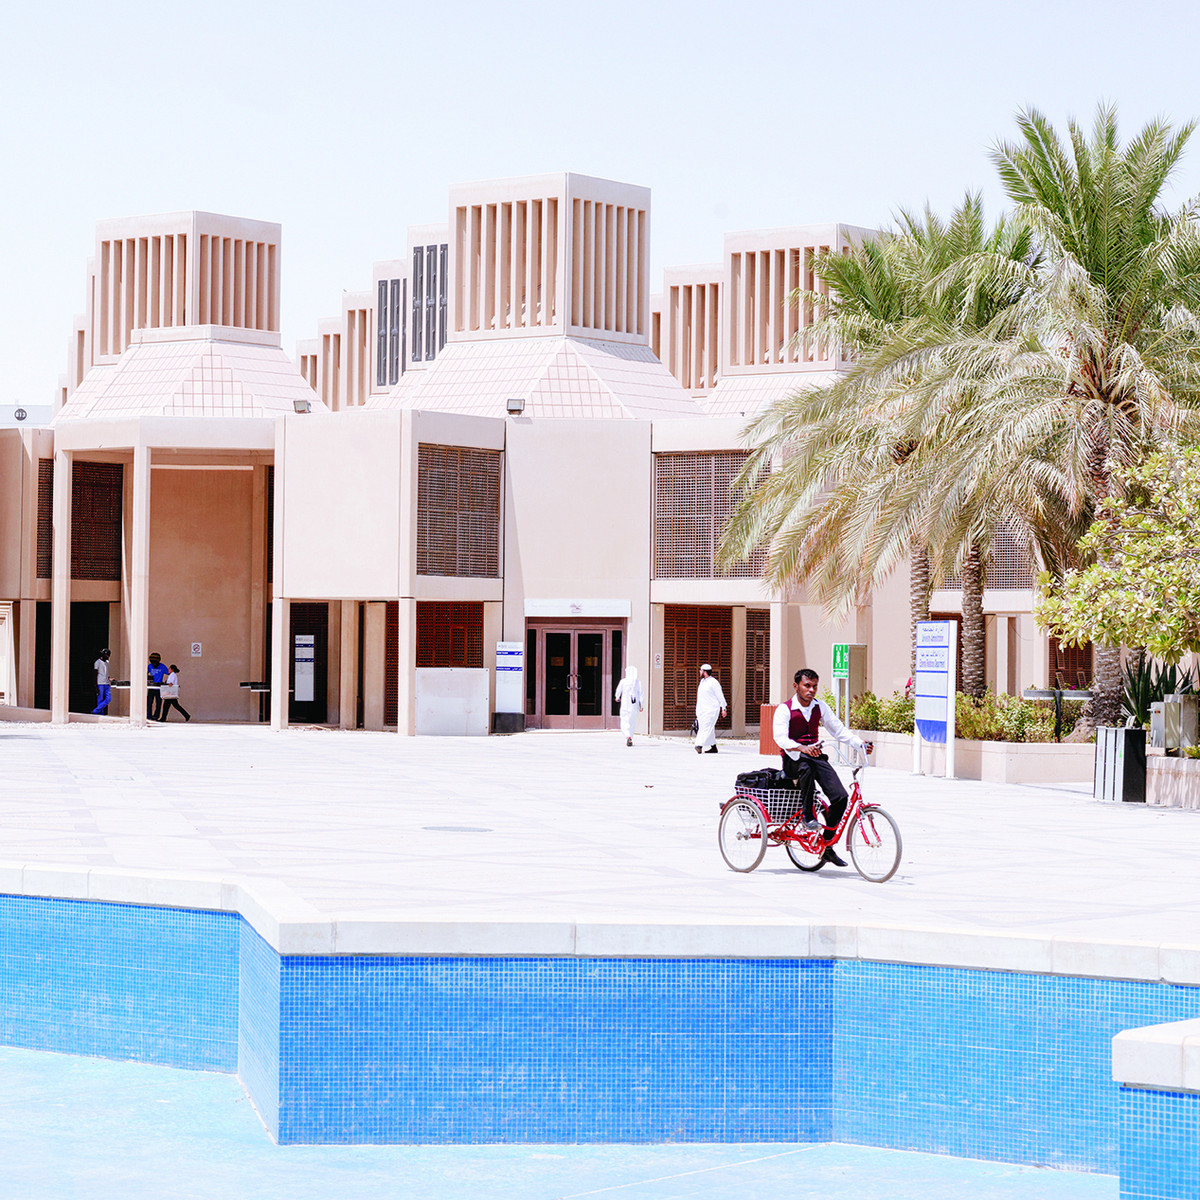 Qatar University in Doha, Qatar Designed by Kamal El Kafrawi, 1974–1983 © Markus Elblaus